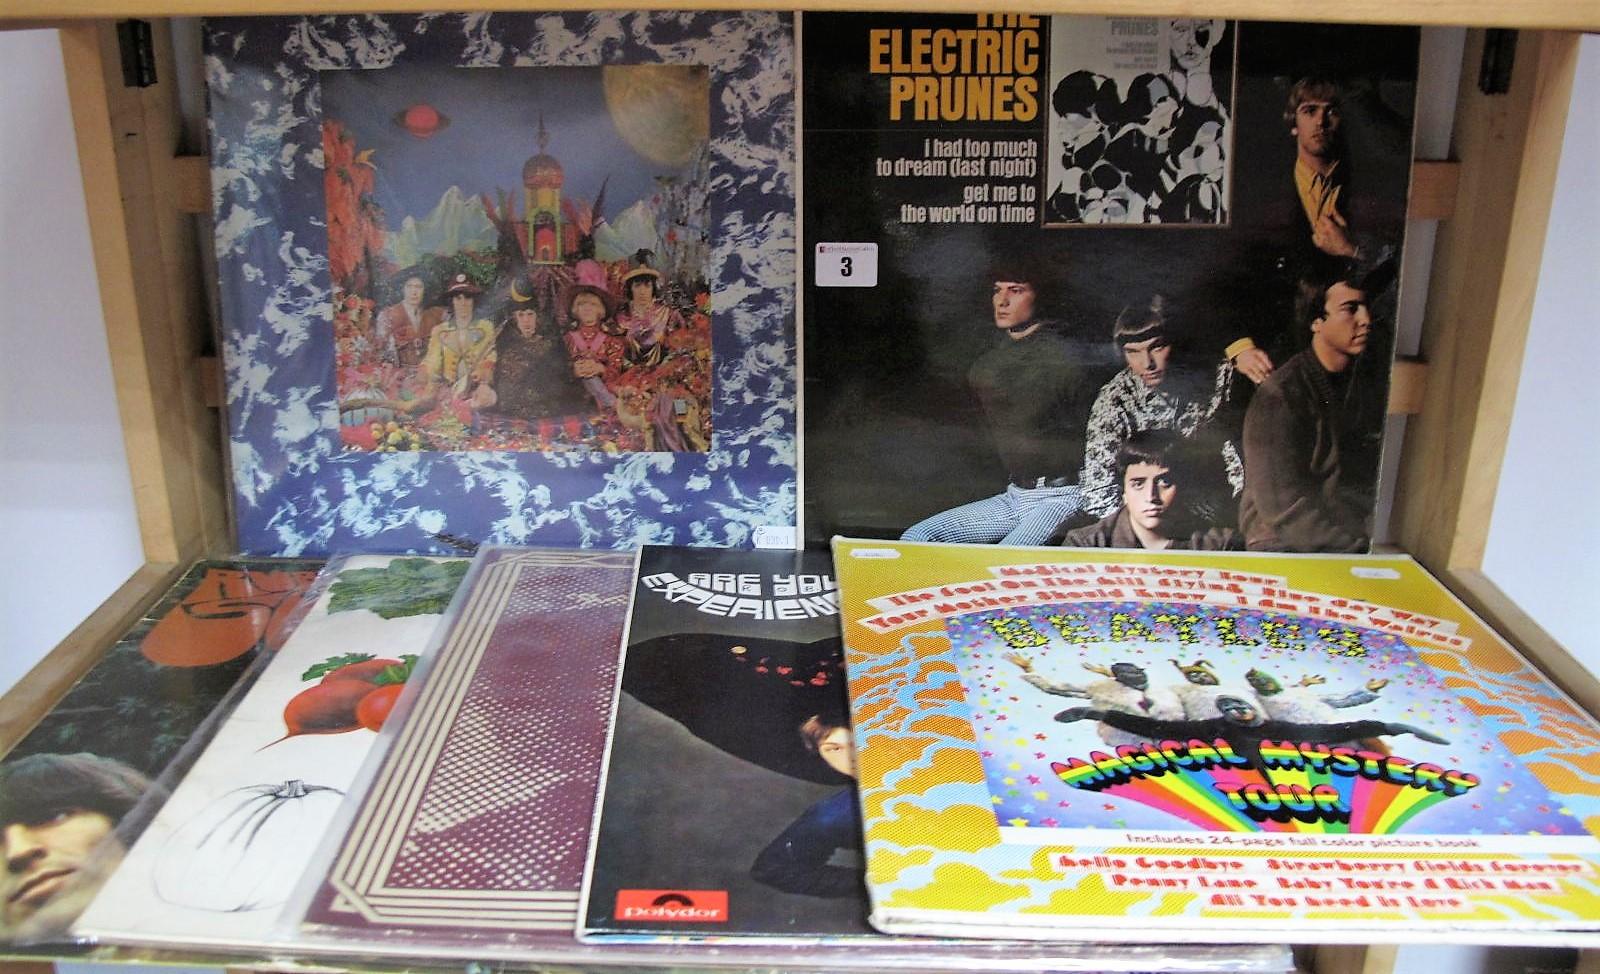 Lot 3 - Psych/Rock LP's - 'Satanic Majesties LP (Stereo, green boxed Decca, 1969); Electric Prunes s/t LP (